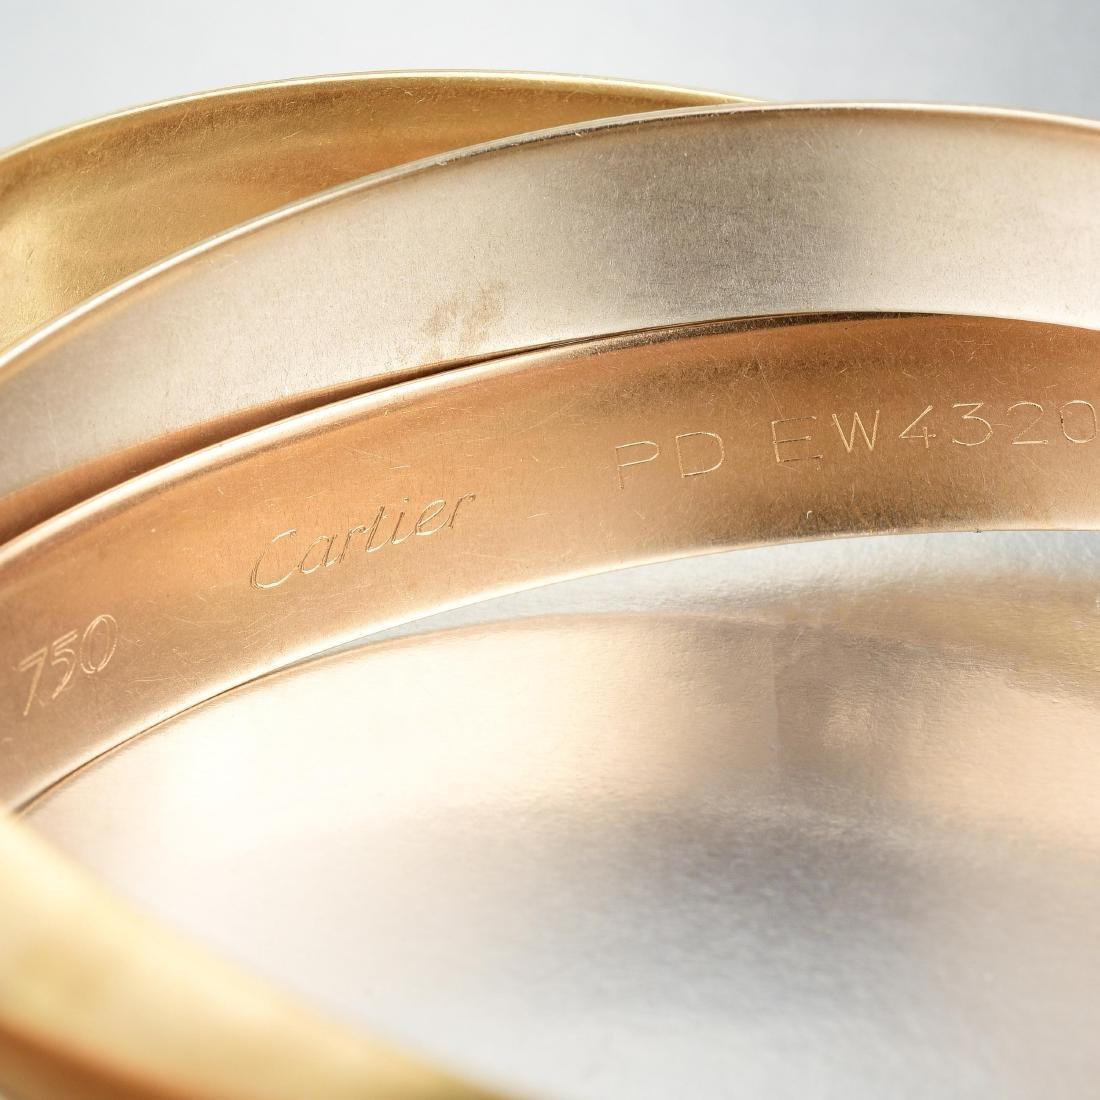 Cartier Trinity Bangle Bracelet, Large Model - 3